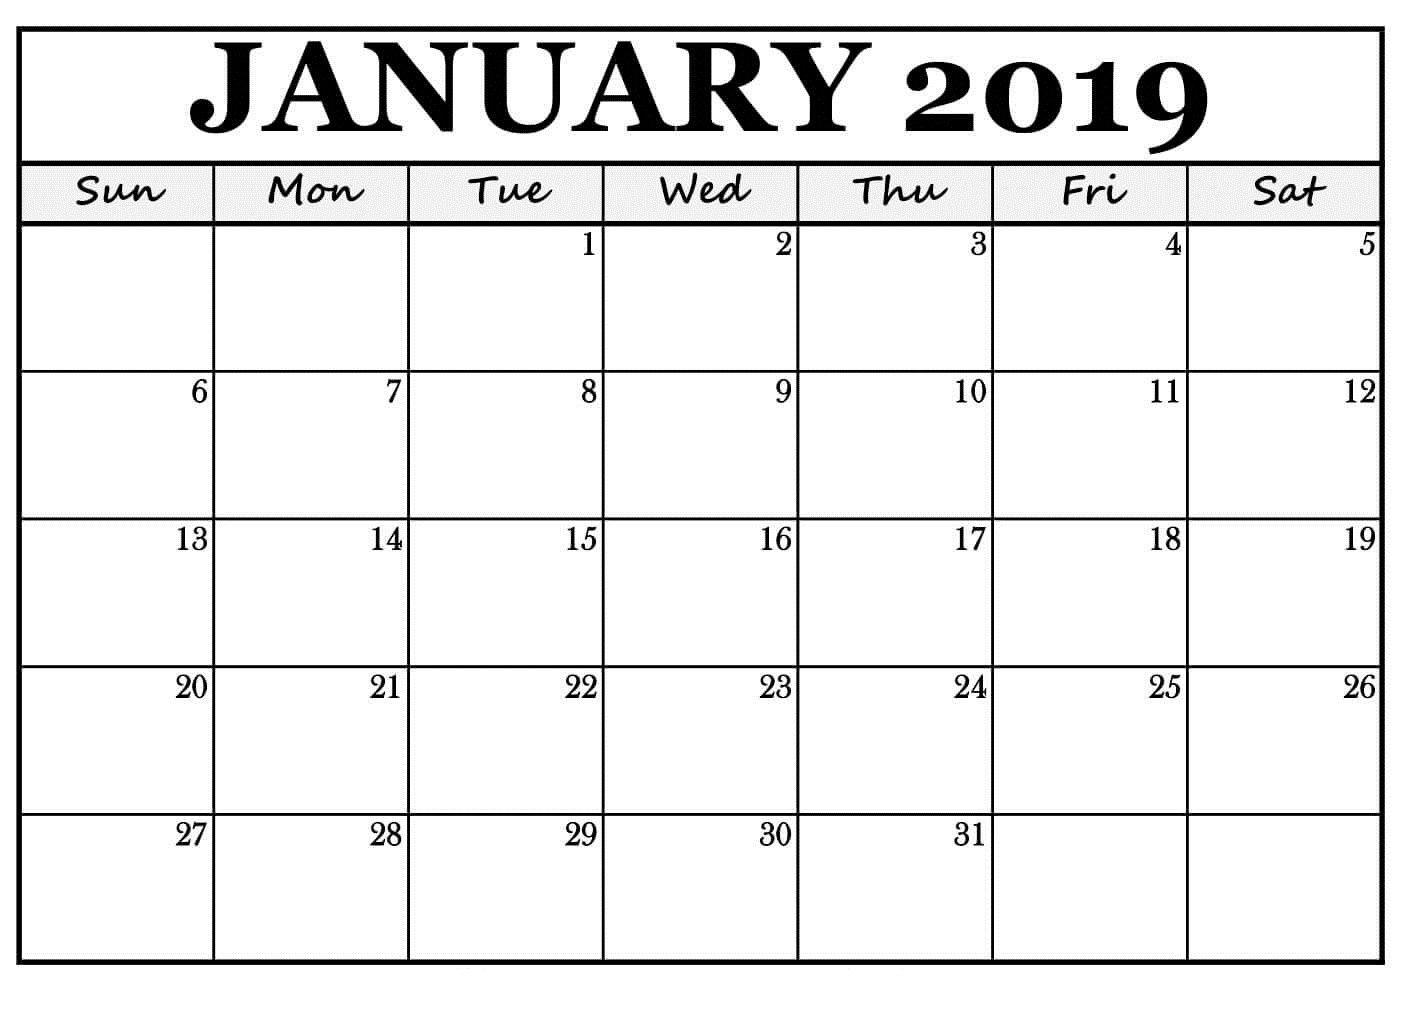 January 2019 Calendar Reminders Free Template | January 2019 Calendar 2019 January Template